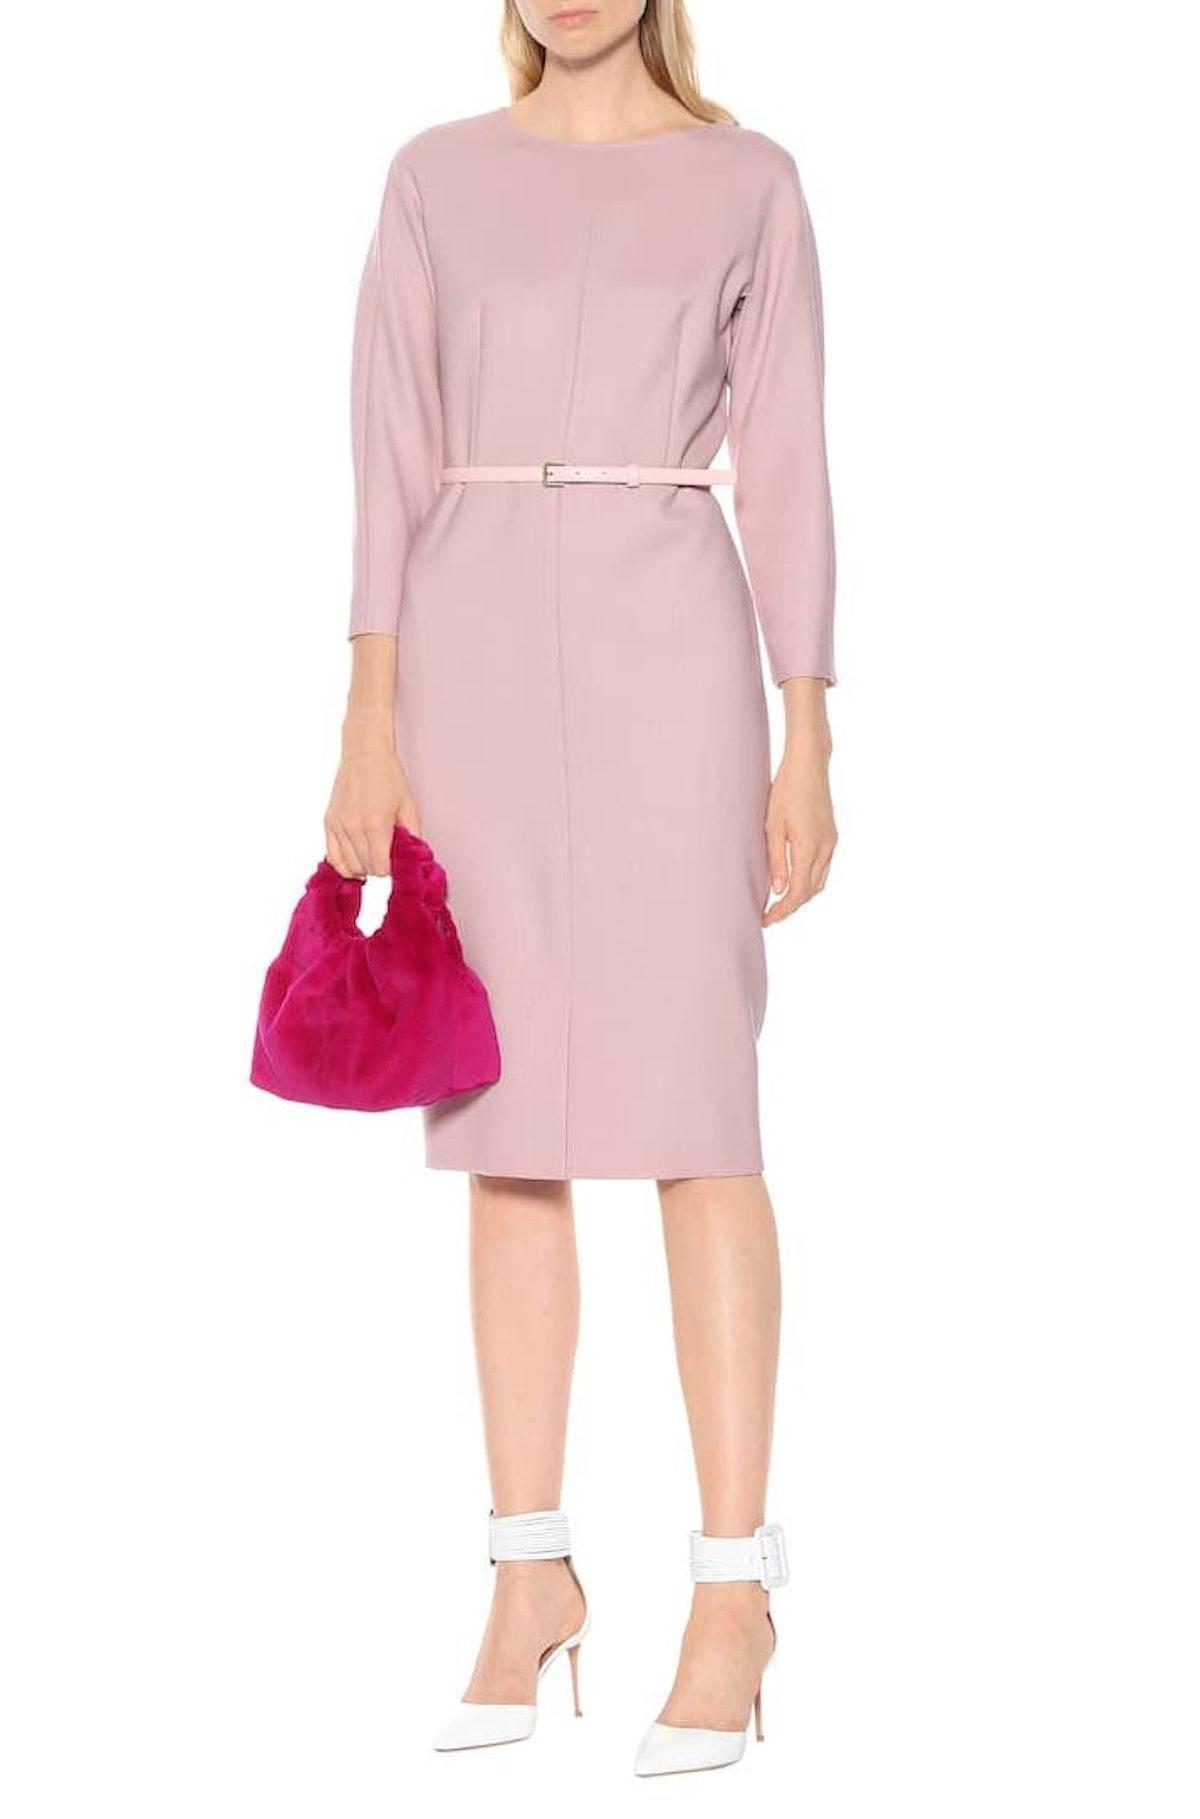 Karub Stretch Wool Dress